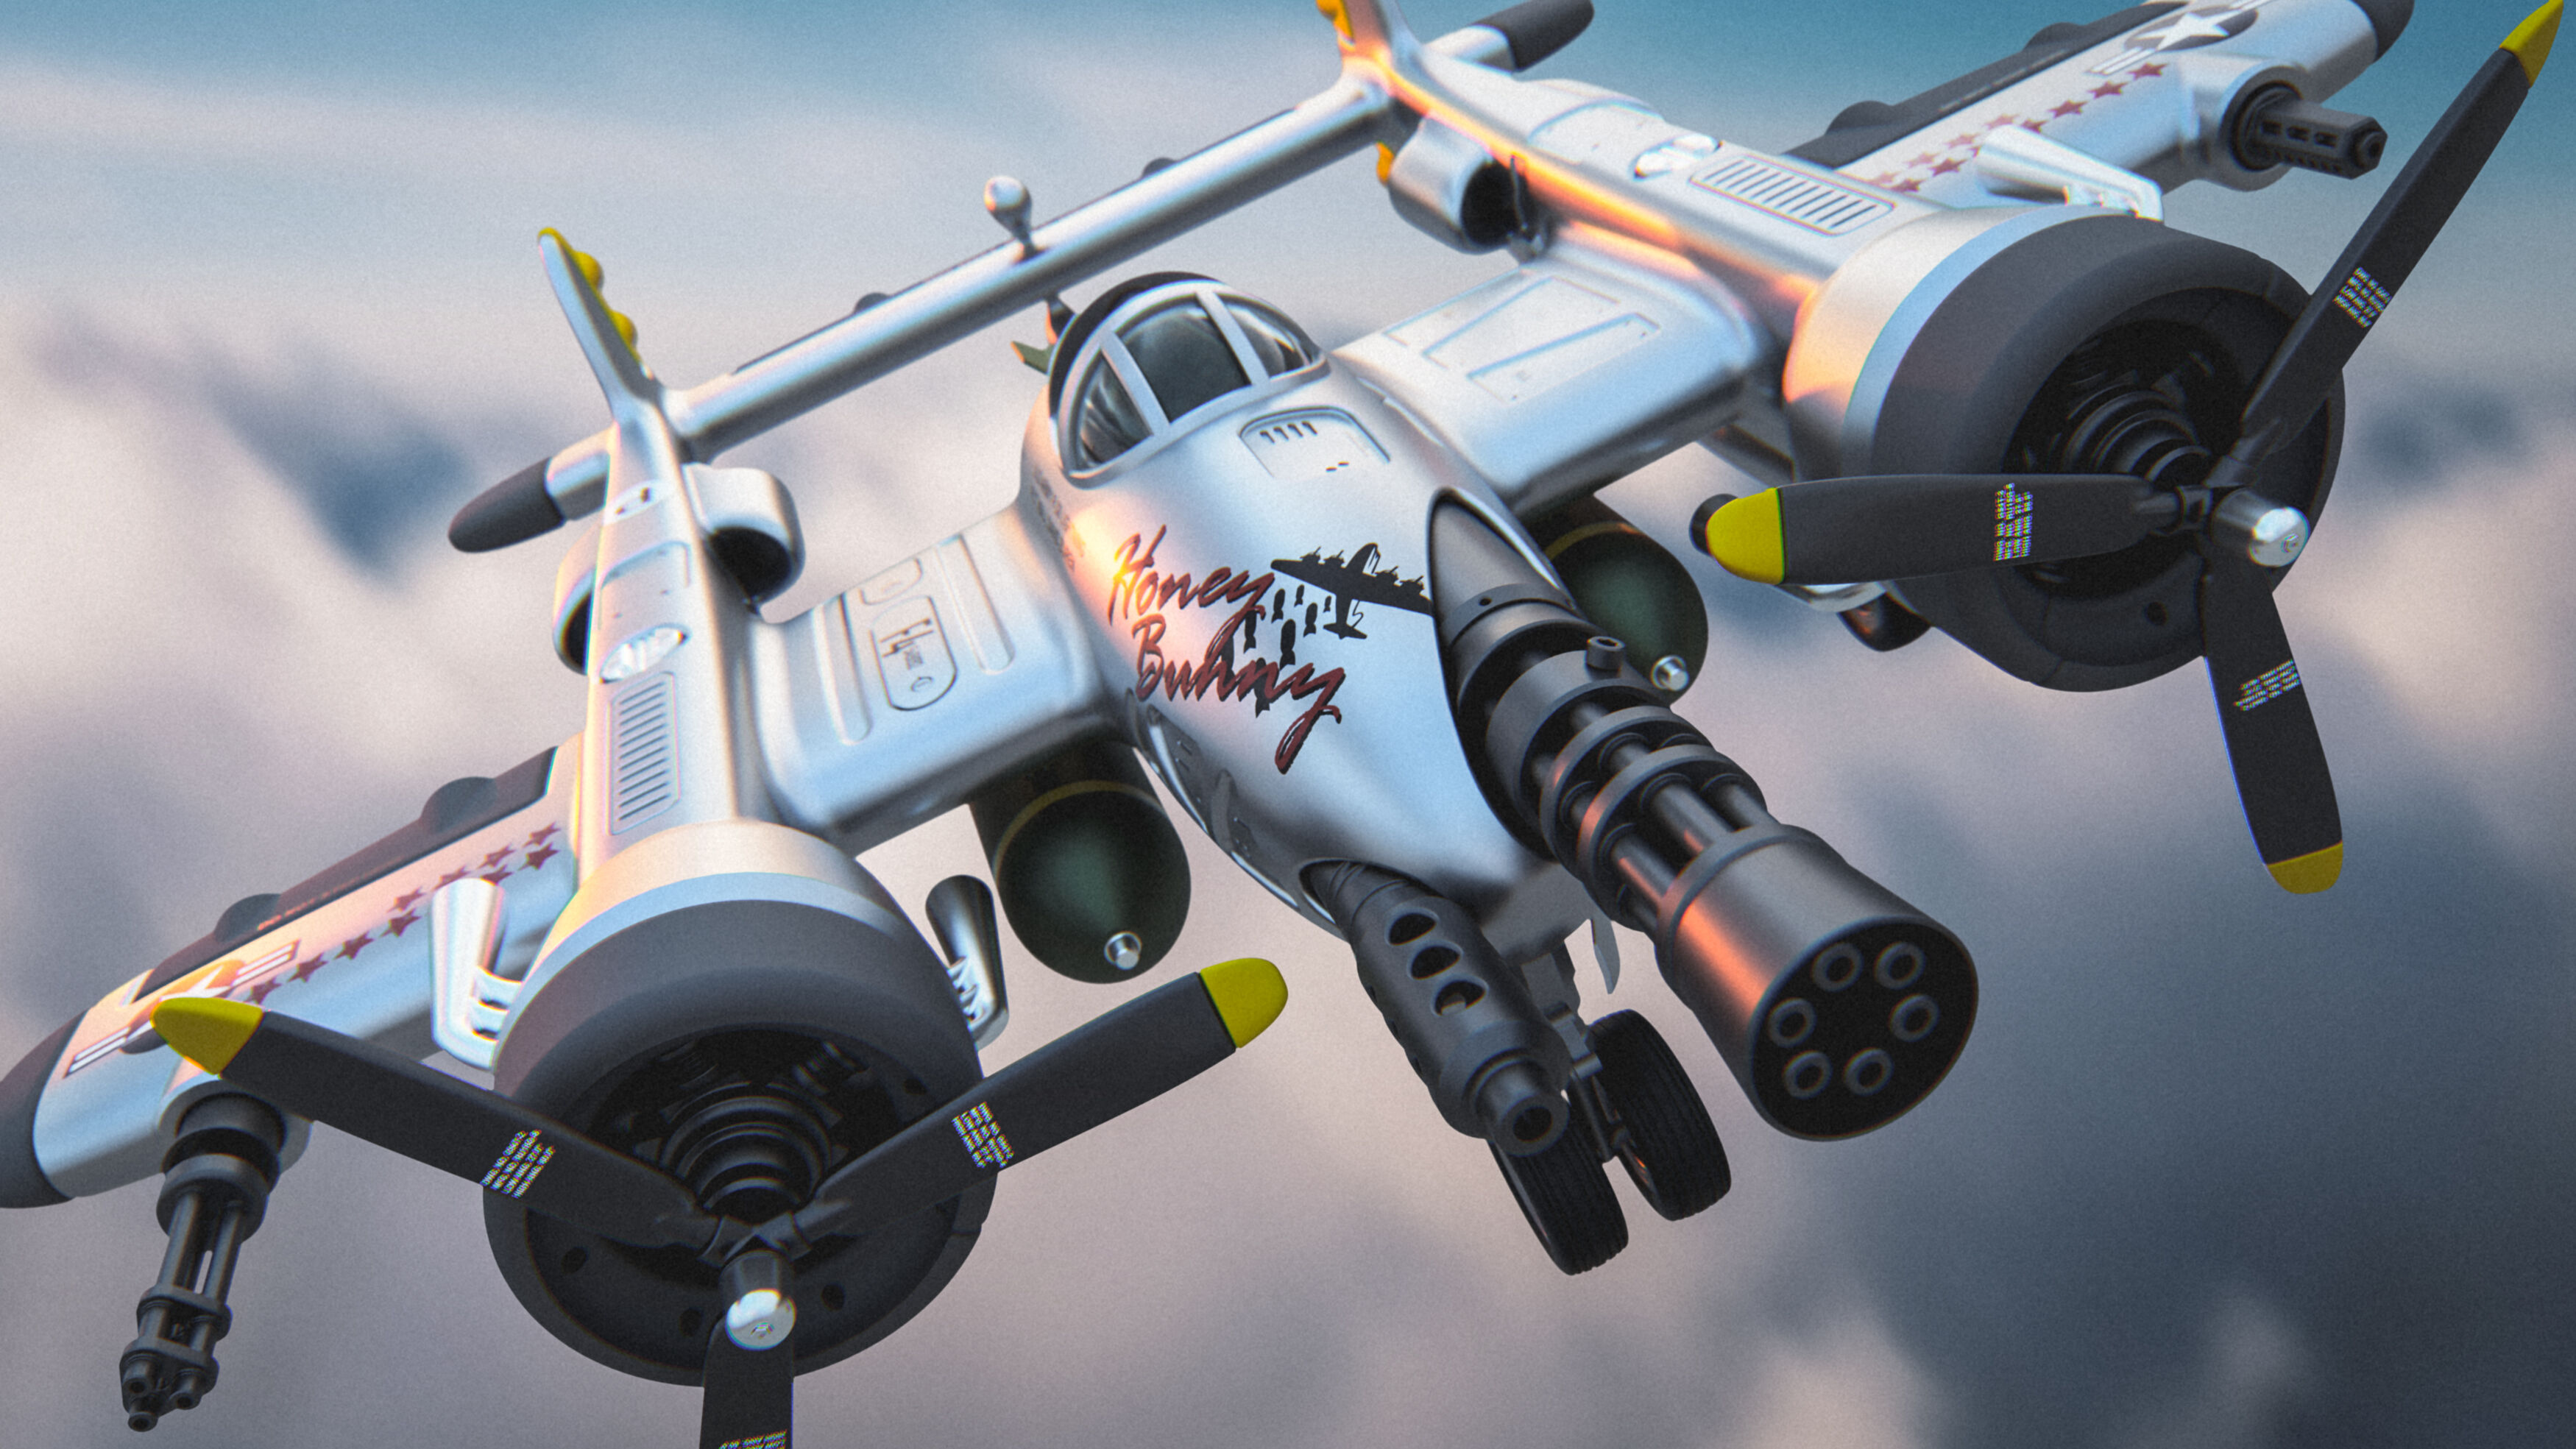 P-38-lightning-02-3500-3500